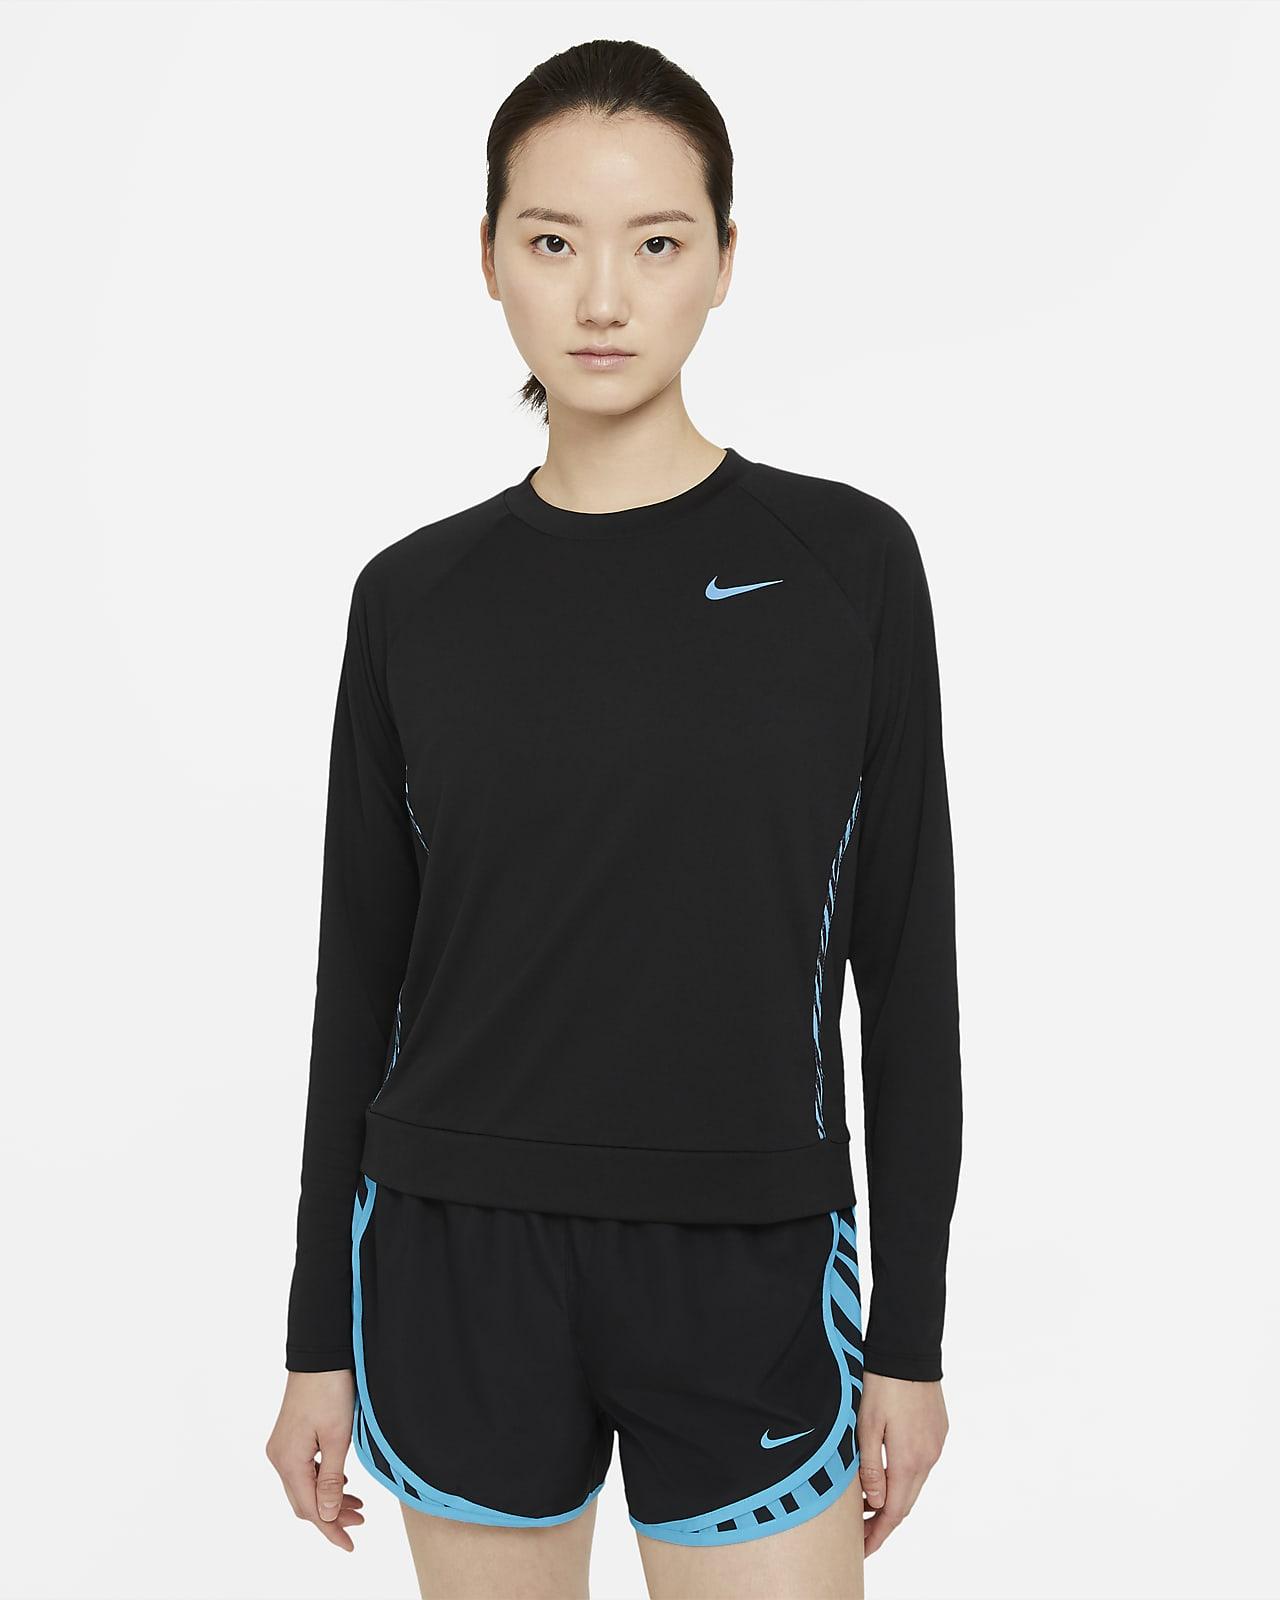 Nike Icon Clash Women's Running Top